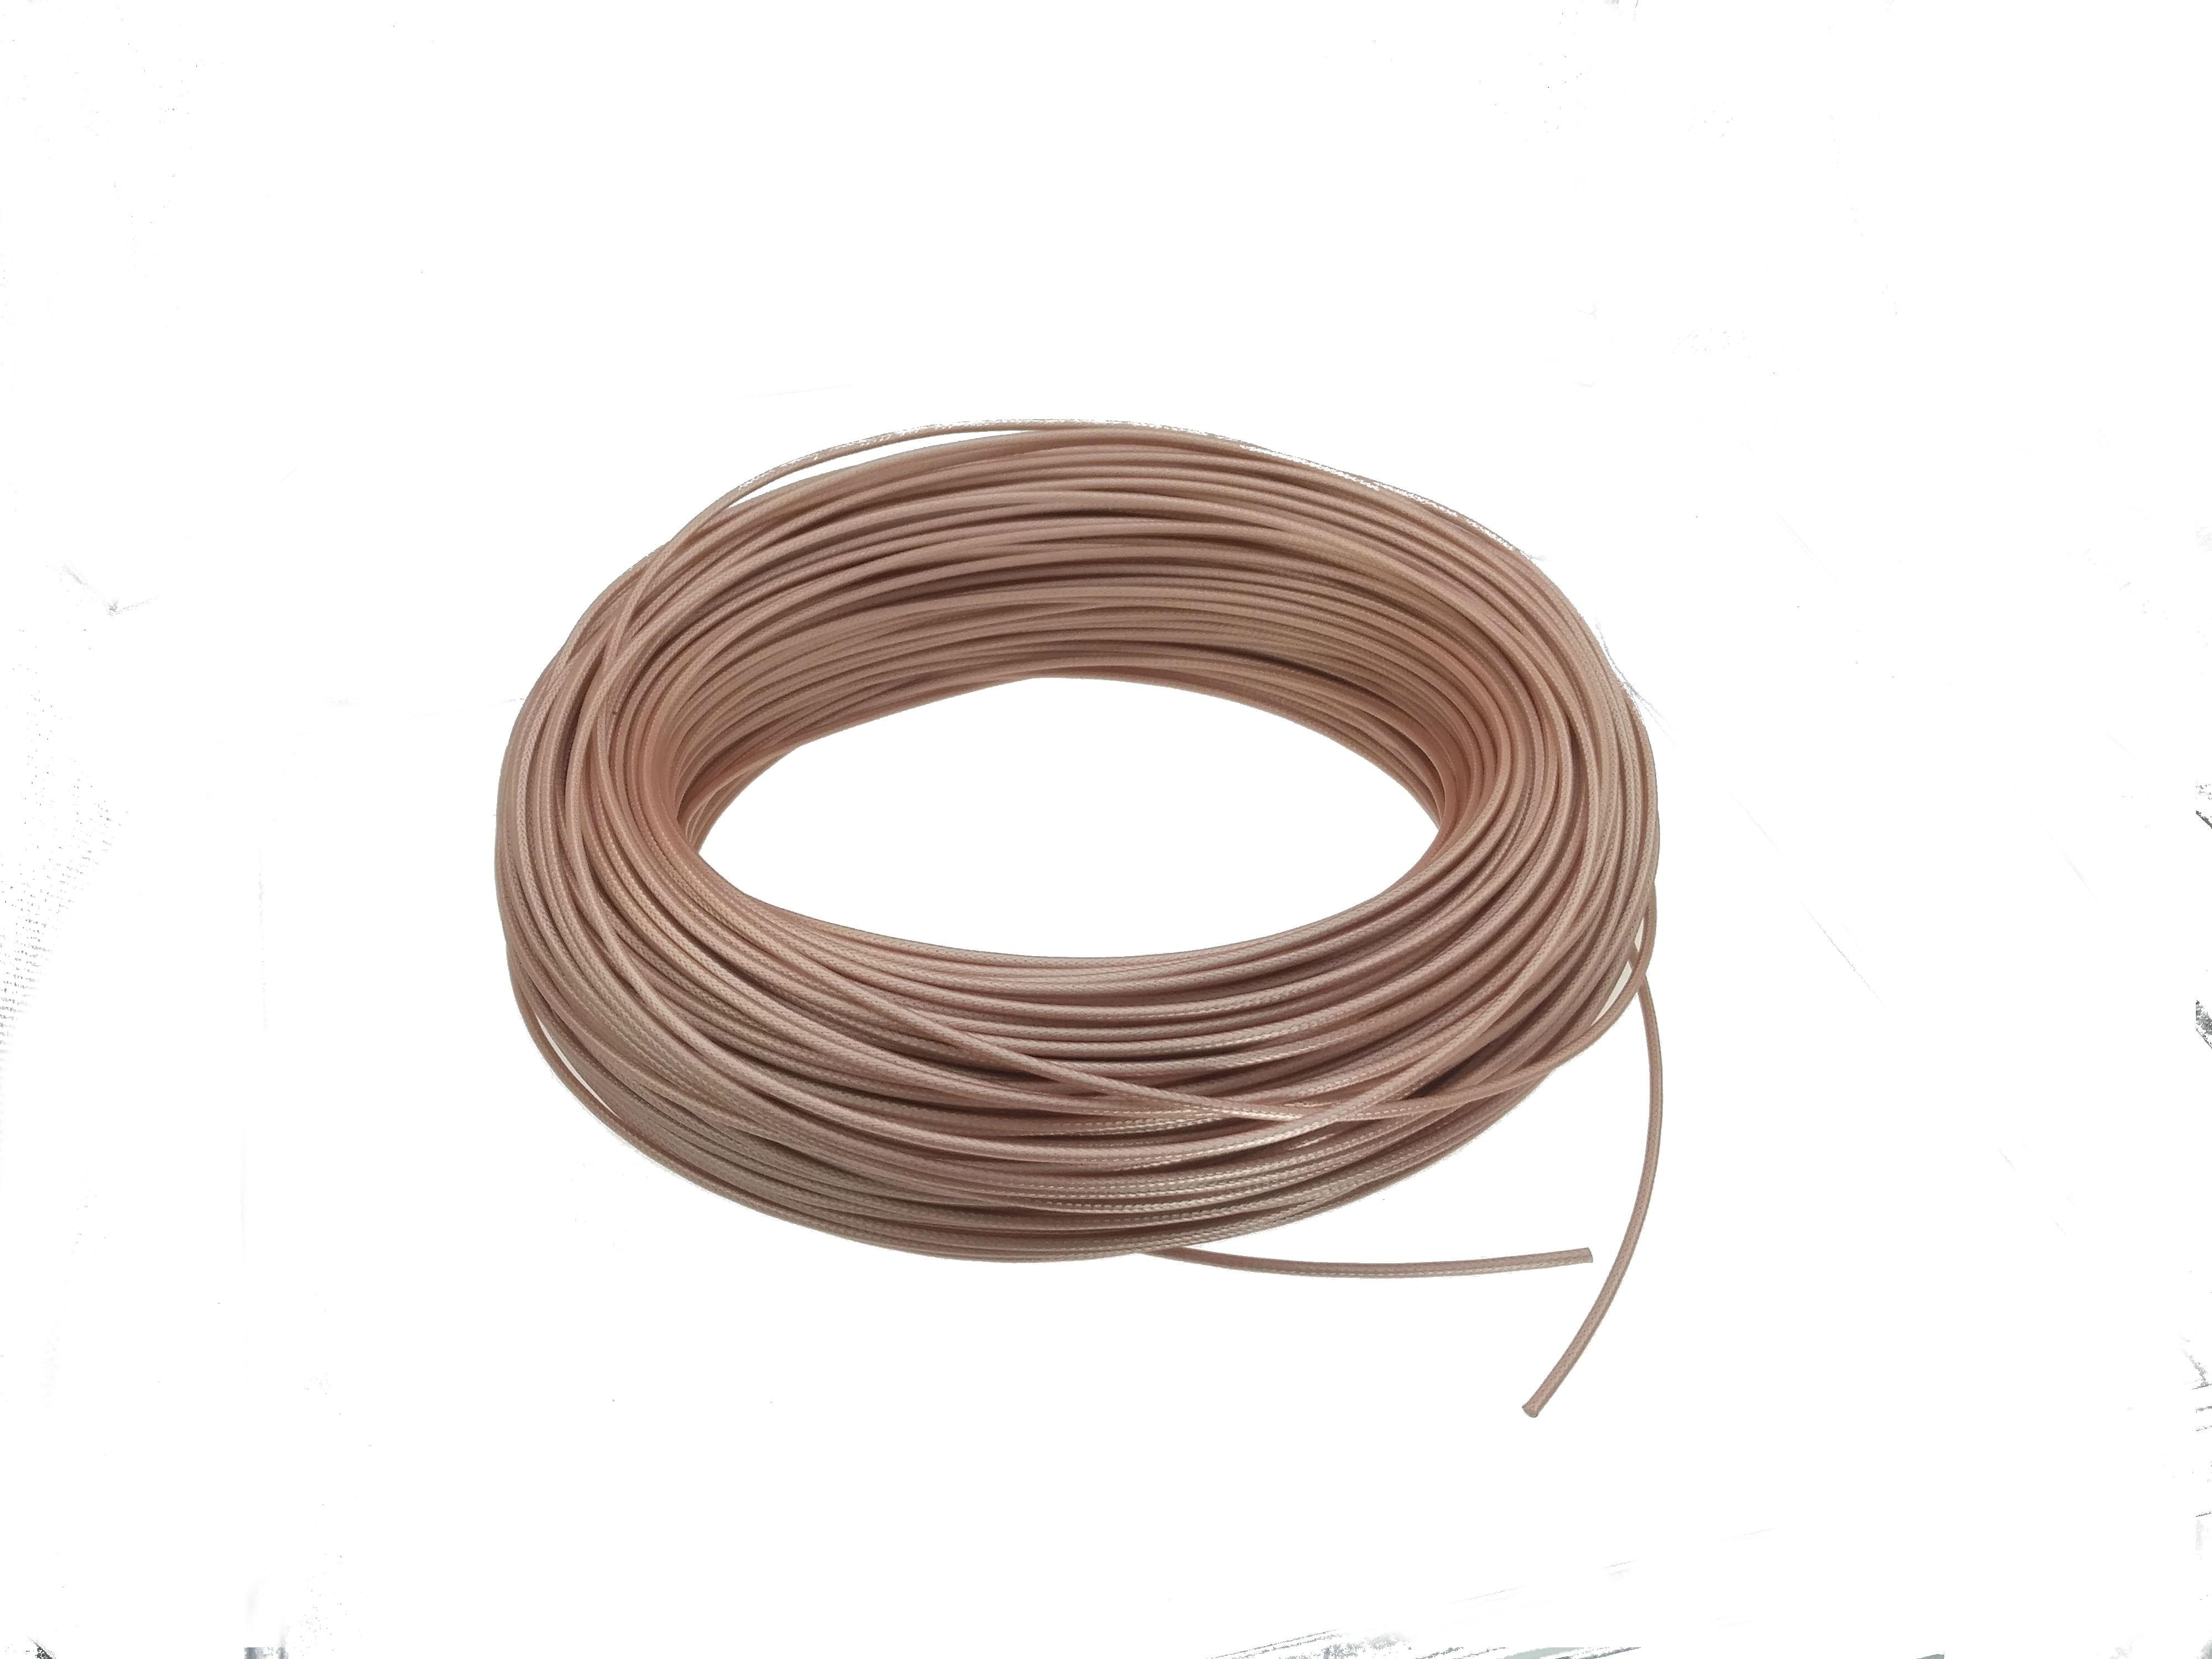 300 Feet RG174 Copper Braid Shielded Flexible RF Coaxial Cable